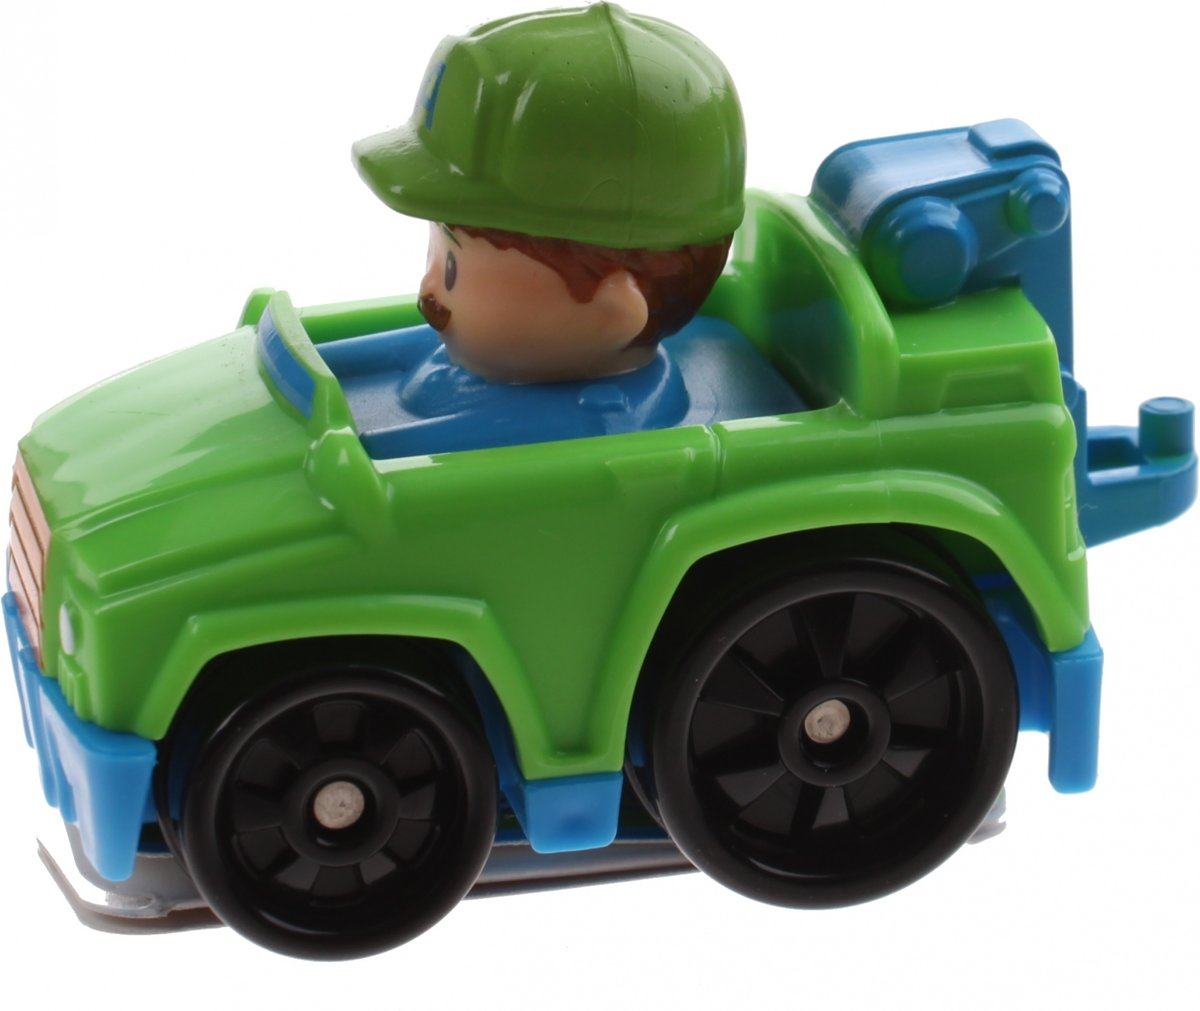 Fisher-price Little People Wheelies Auto 6,5 Cm Groen (drg95)